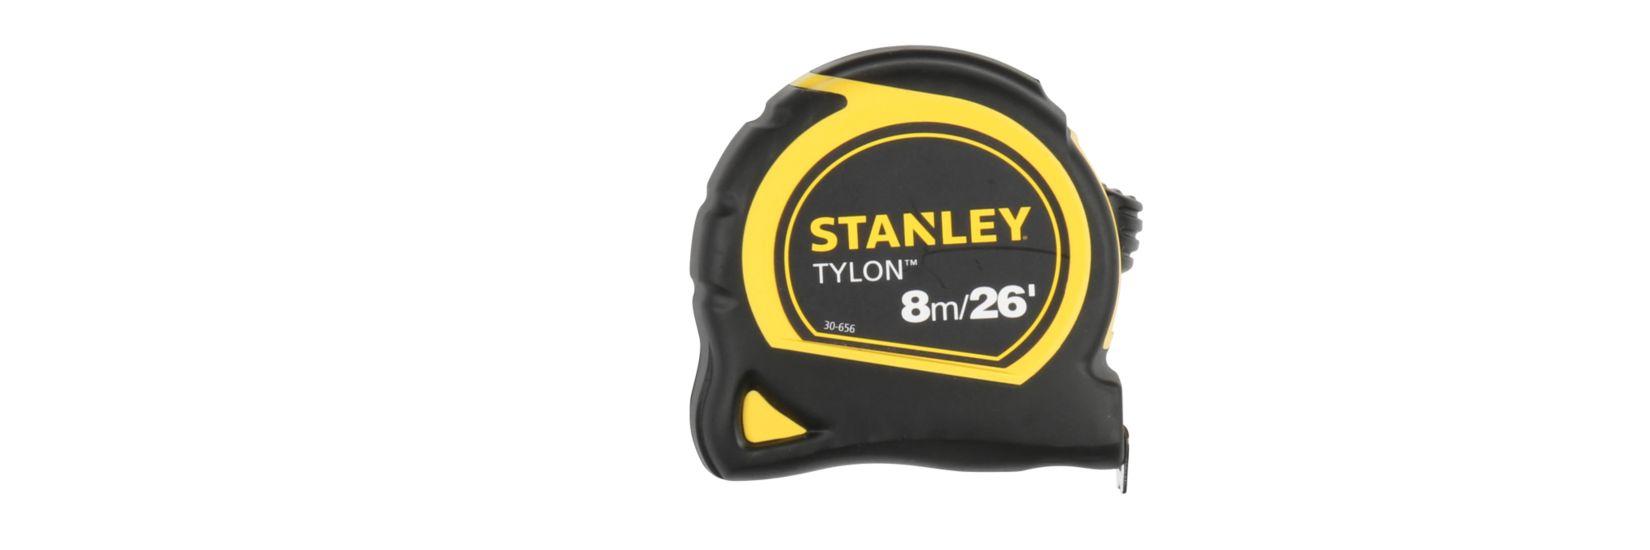 Stanley 1-30-656 Tylon Tape Measure - 8m